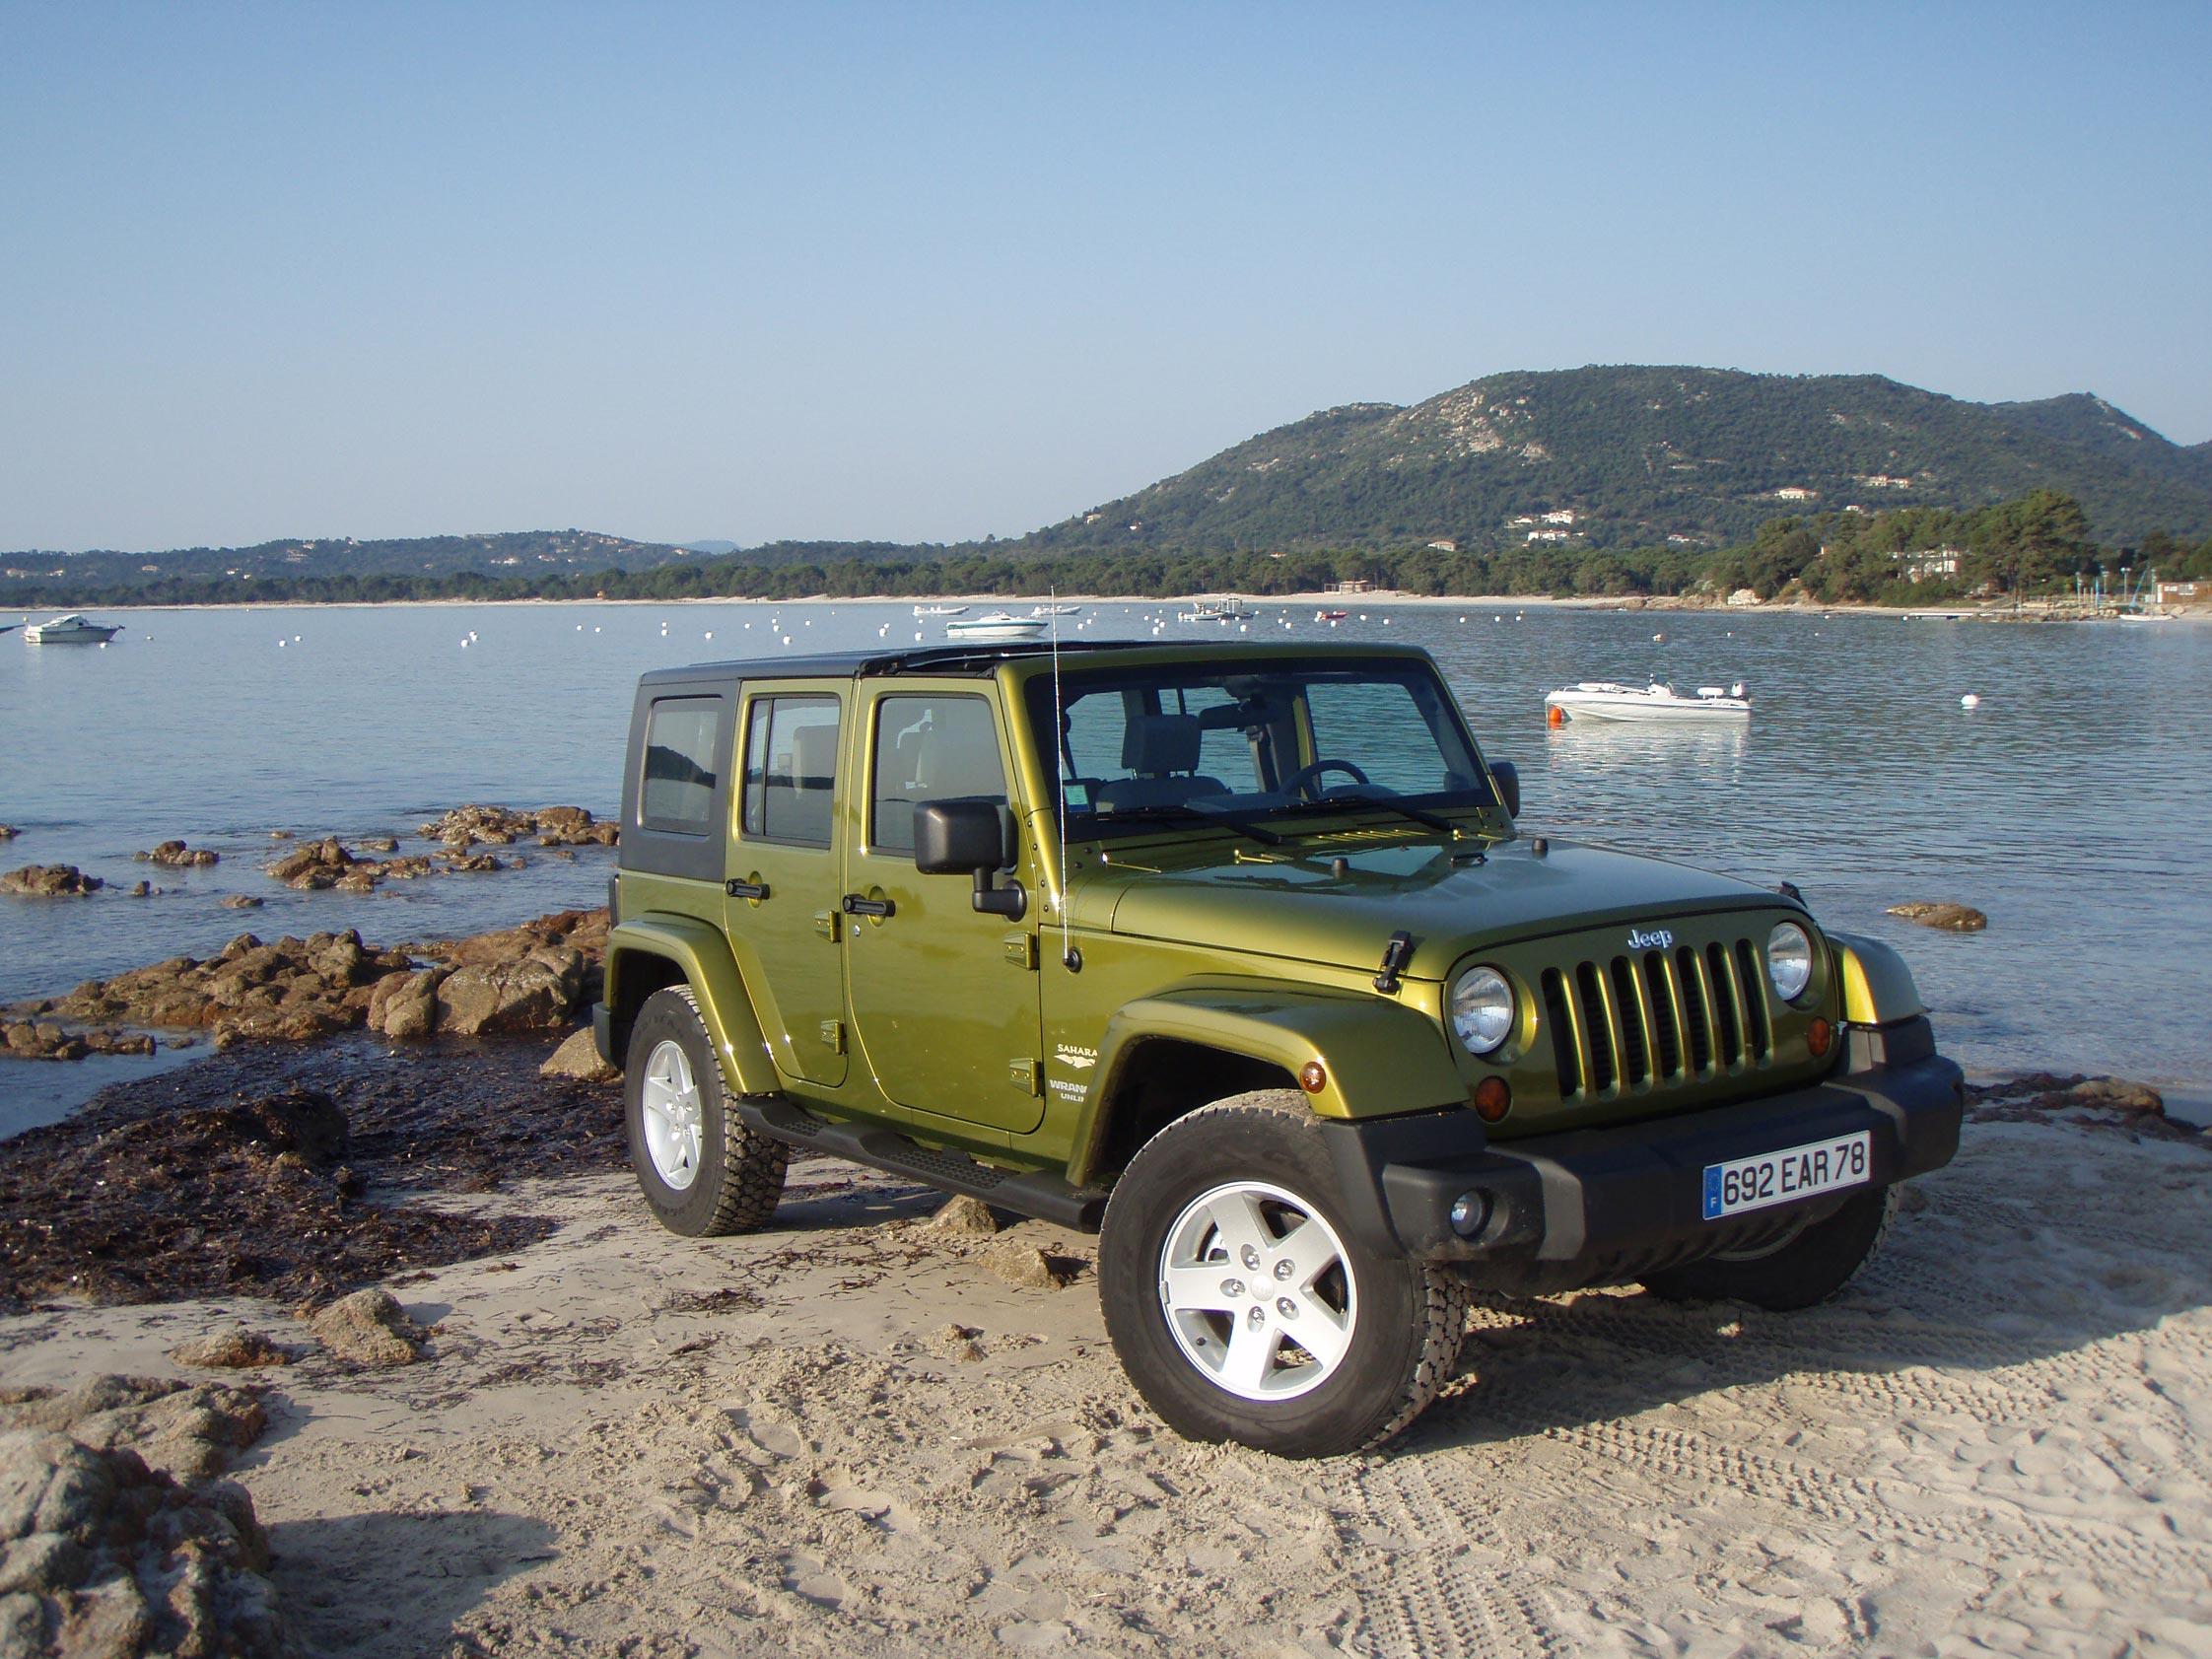 essai jeep wrangler unlimited 2 8 crd auto motorlegend. Black Bedroom Furniture Sets. Home Design Ideas